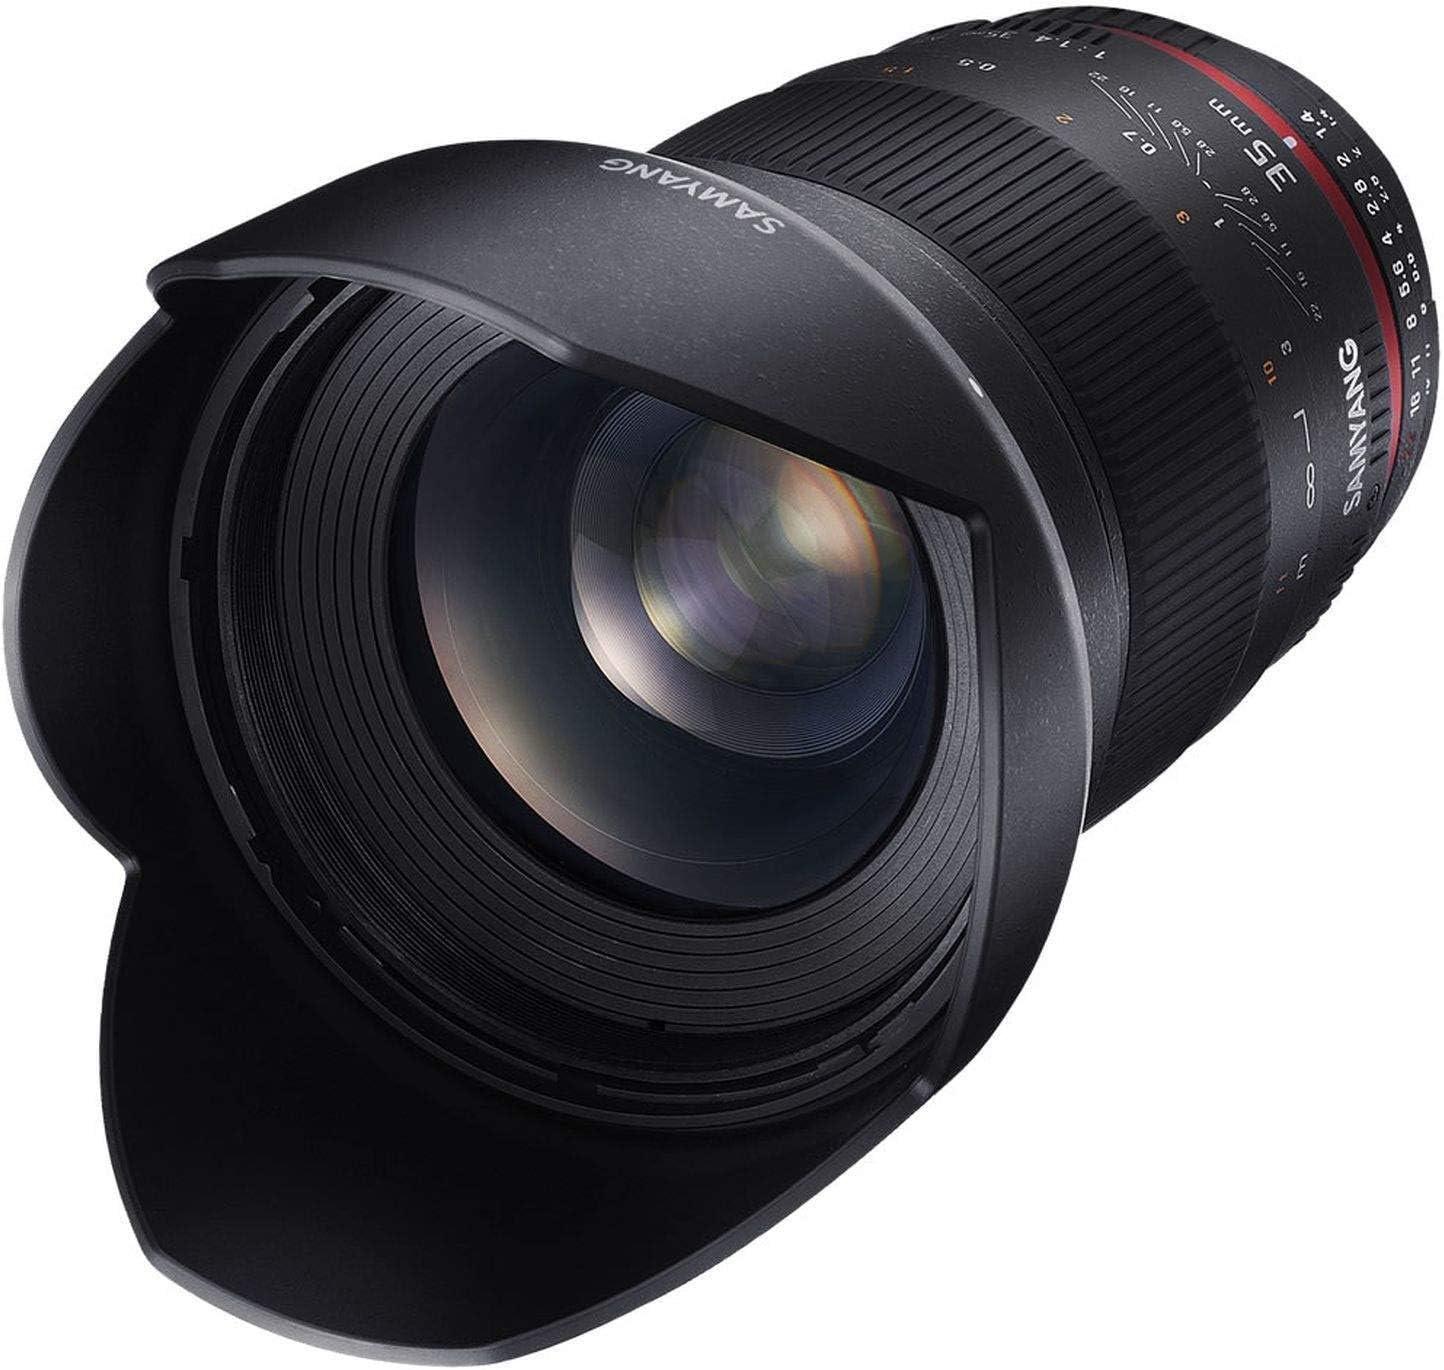 Samyang F1111003101 - Objetivo fotográfico DSLR para Nikon F Ae (Distancia Focal Fija 35mm, Apertura f/1.4-22 AS UMC, diámetro Filtro: 77mm), Negro